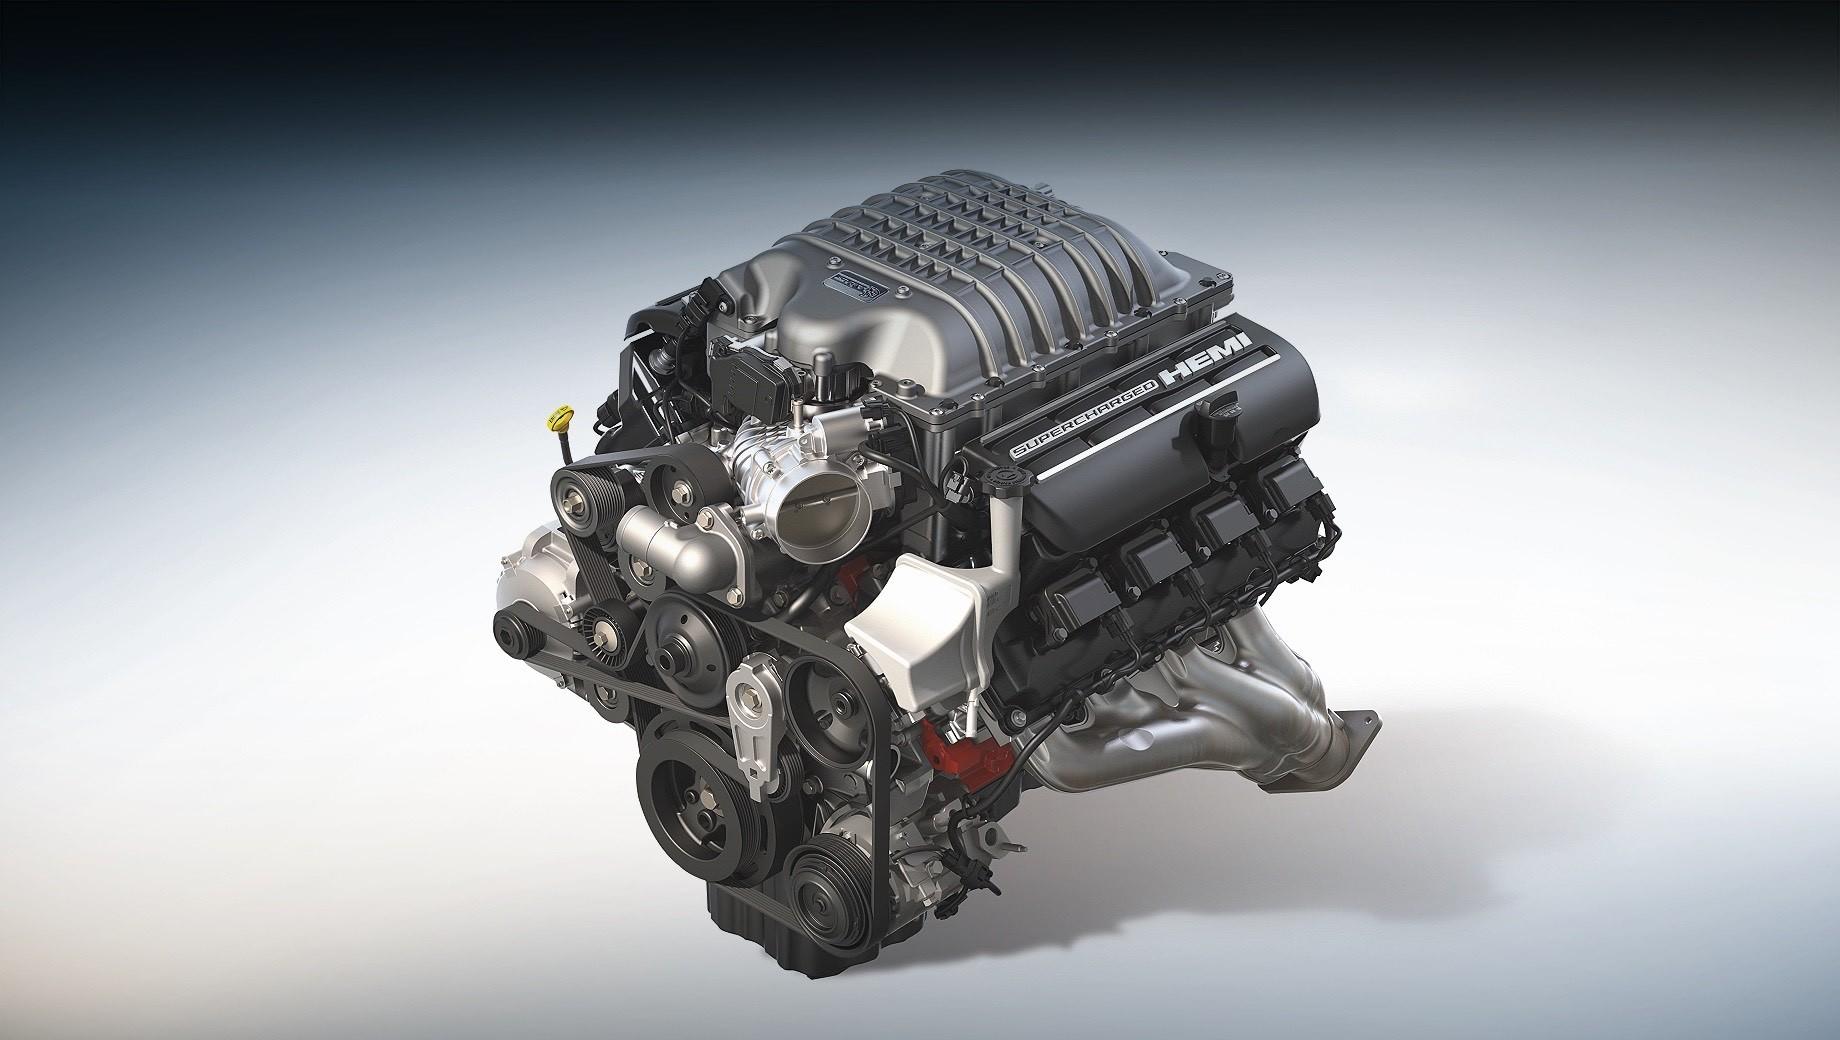 Мотор V8 6.2 Hellcrate Redeye расширил каталог Mopar